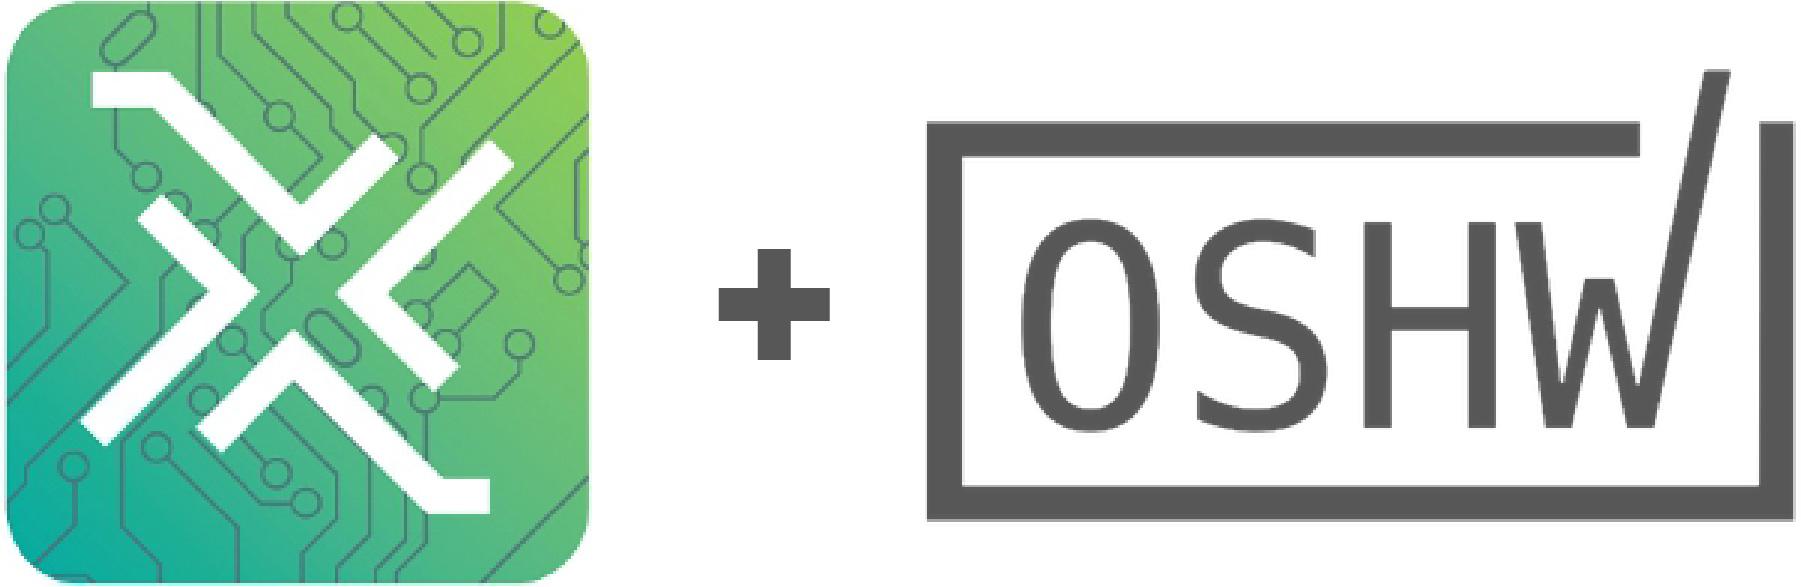 hardwarex + OSHWA certification logo